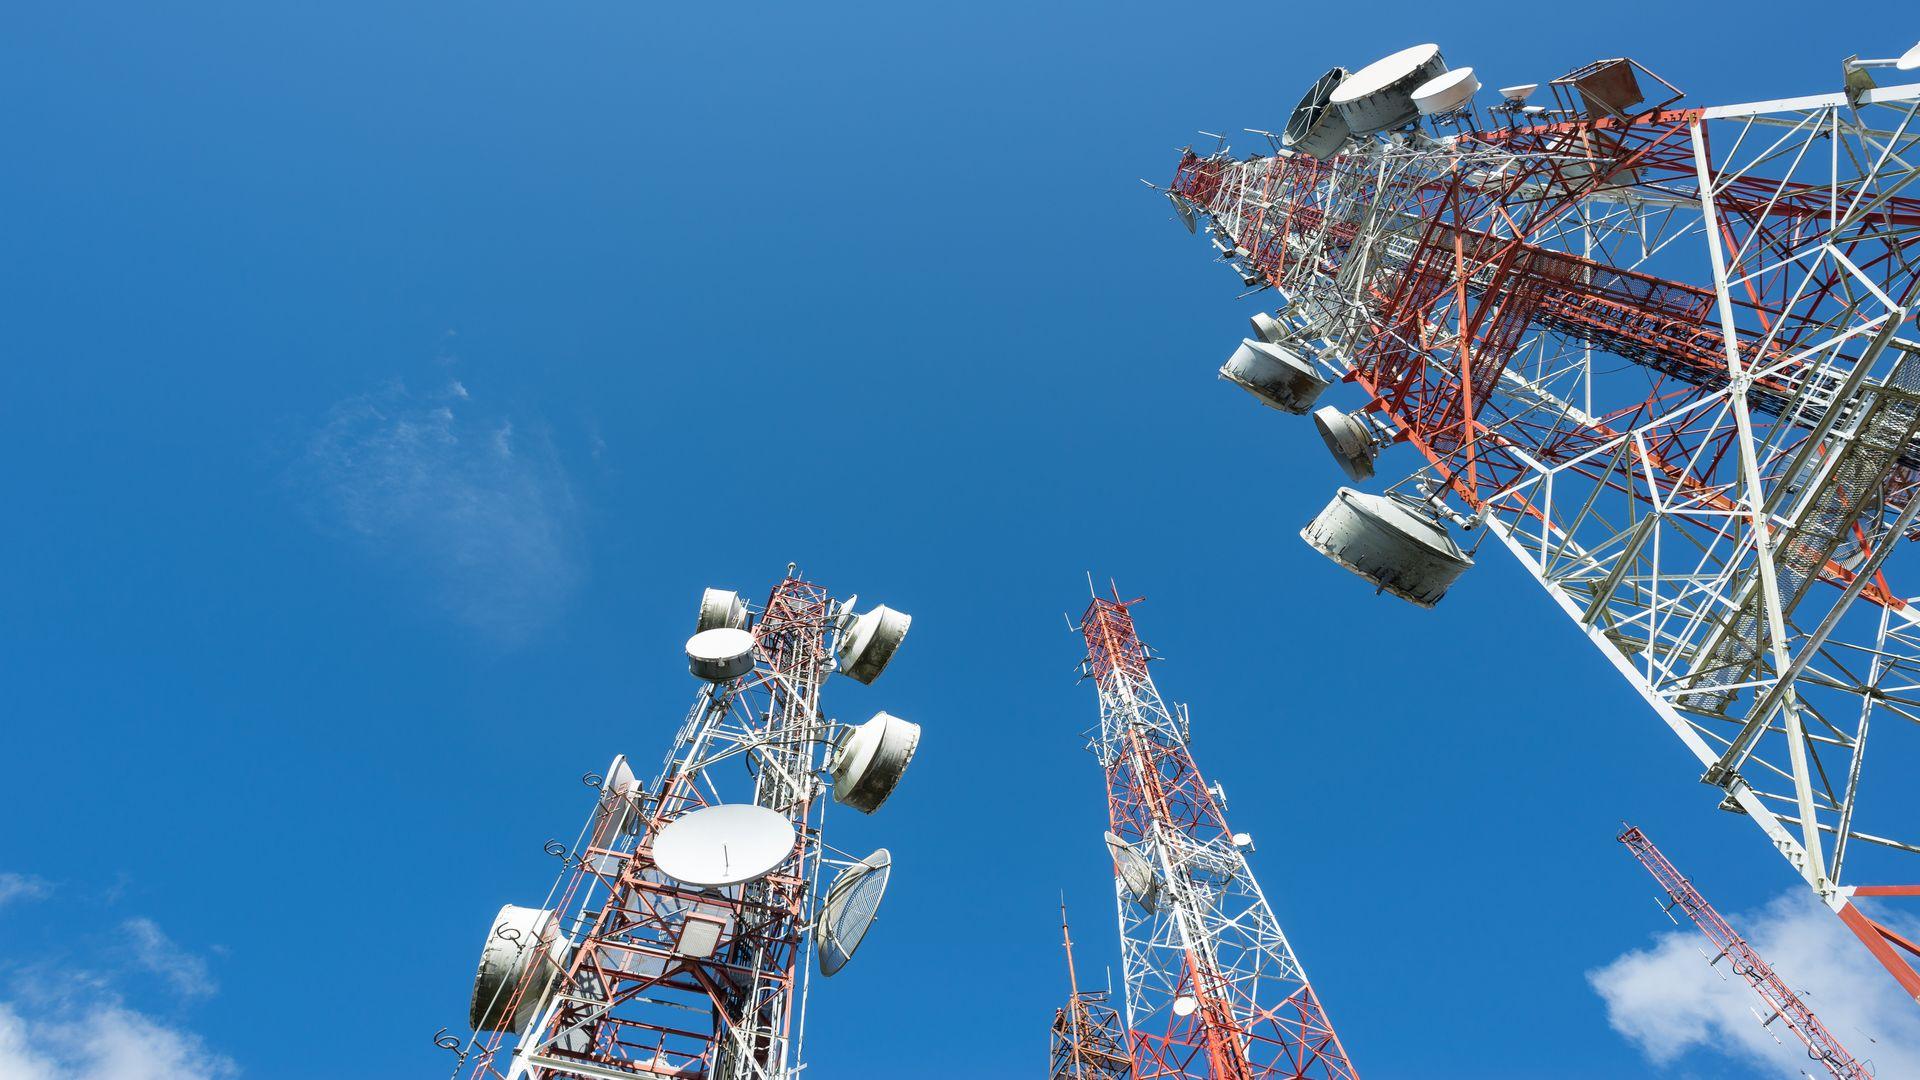 Three big radio mast with blue sky